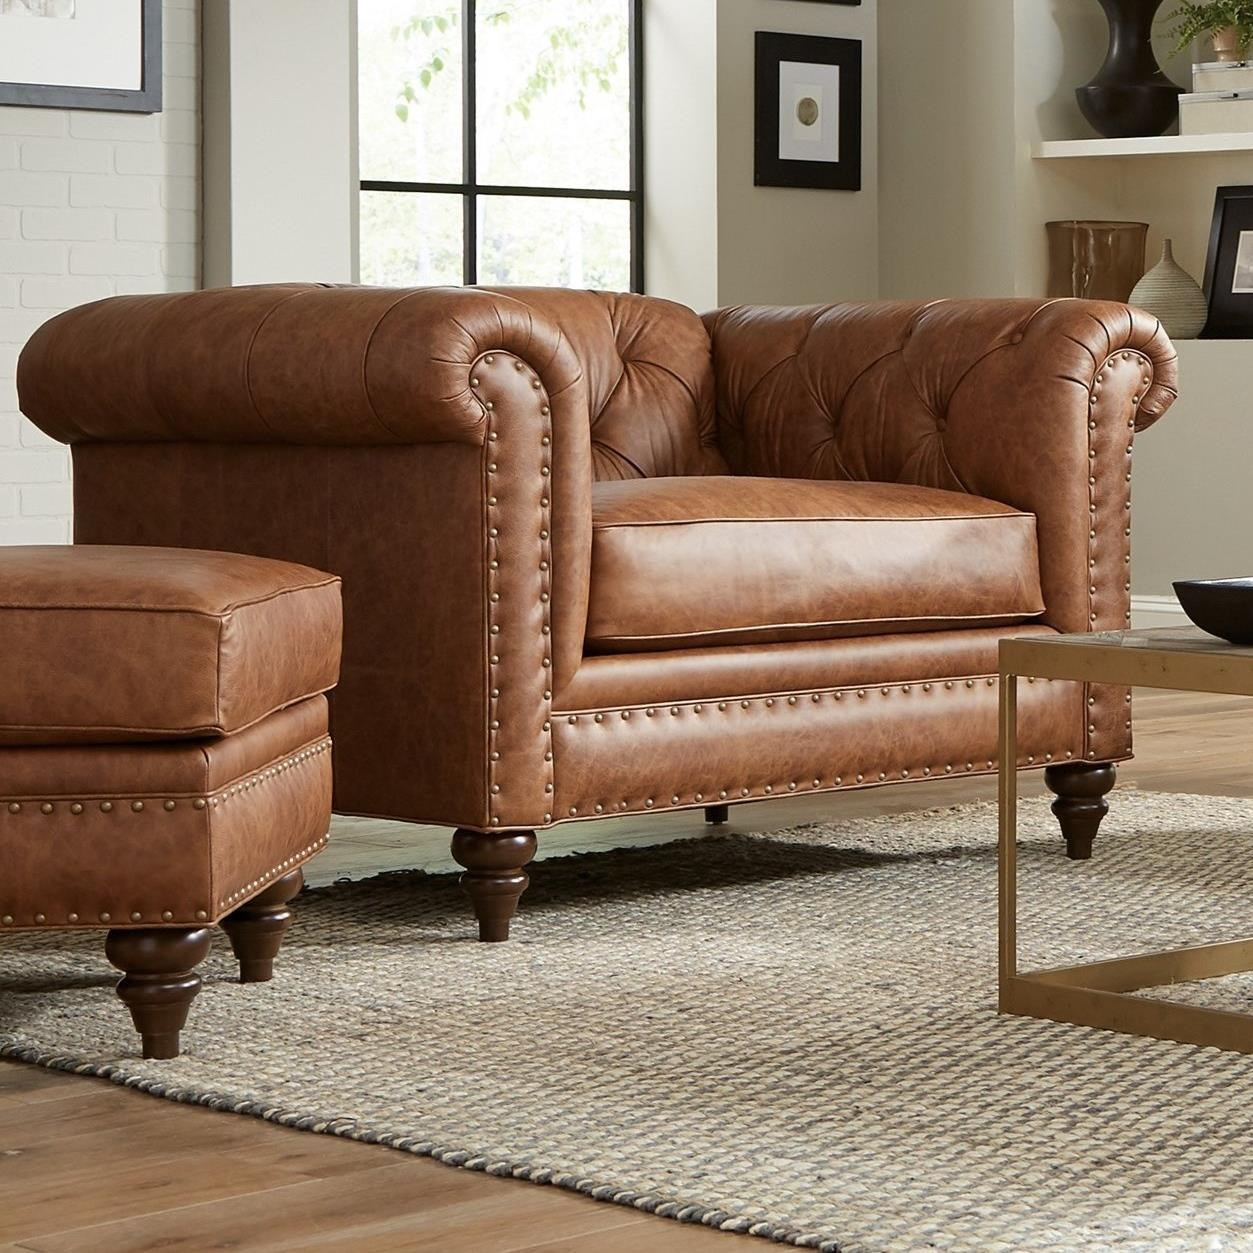 Oversized Chair & Ottoman Set